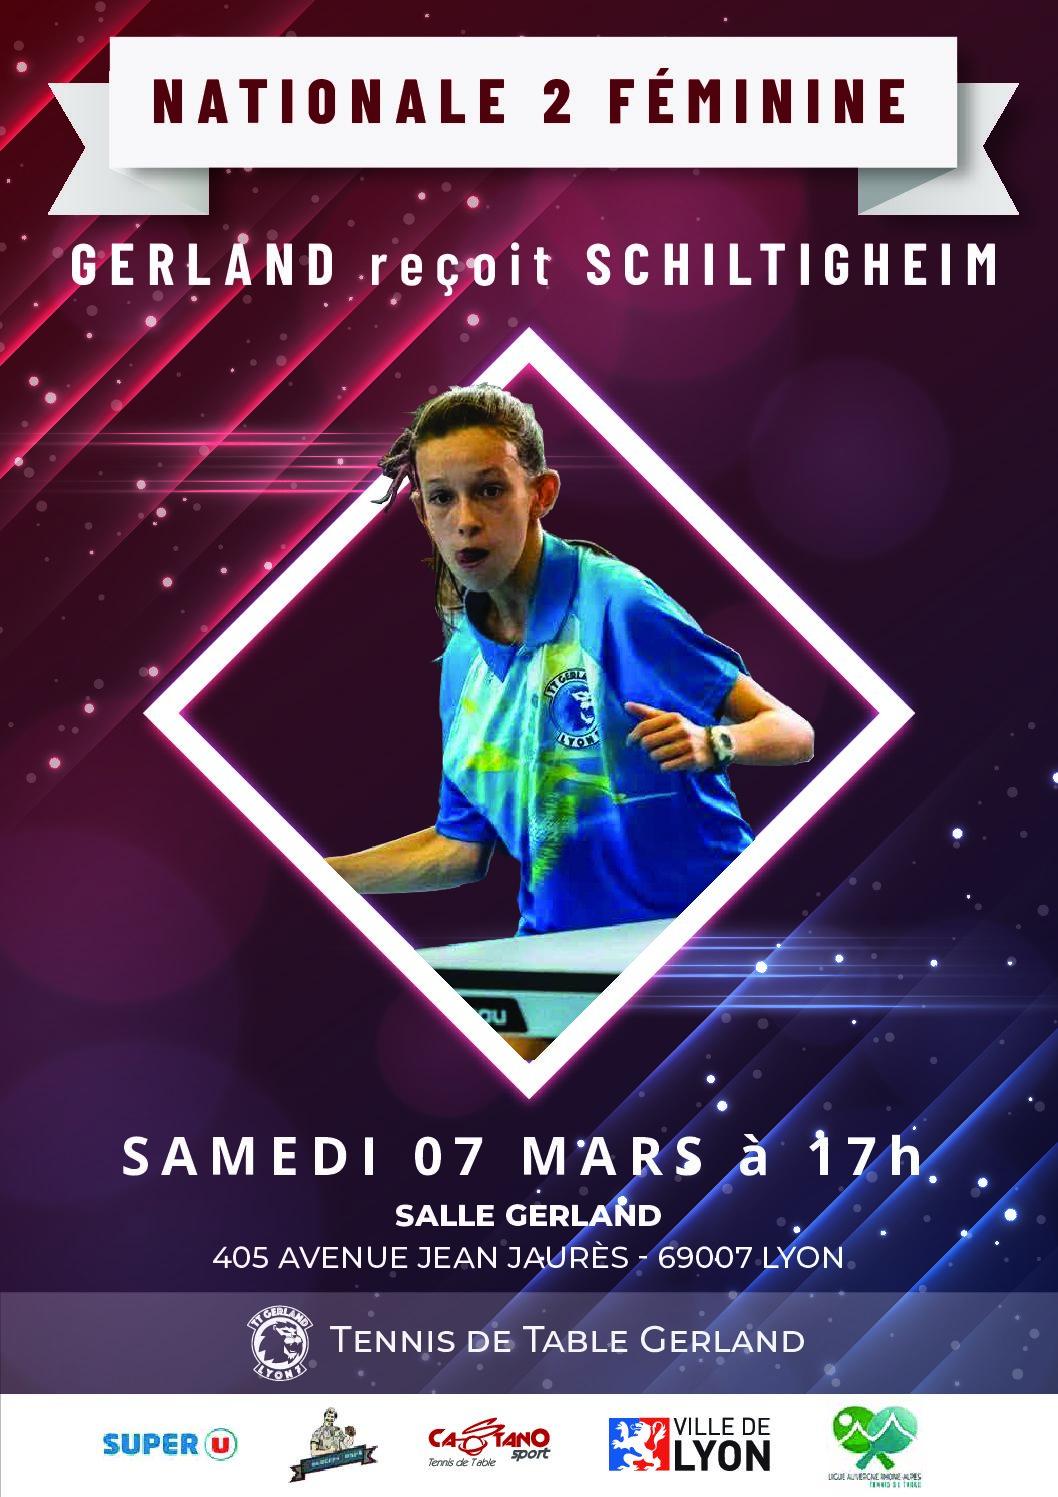 samedi 7 mars 2020 : Nationale 2 féminine – GERLAND reçoit SCHILTIGHEIM